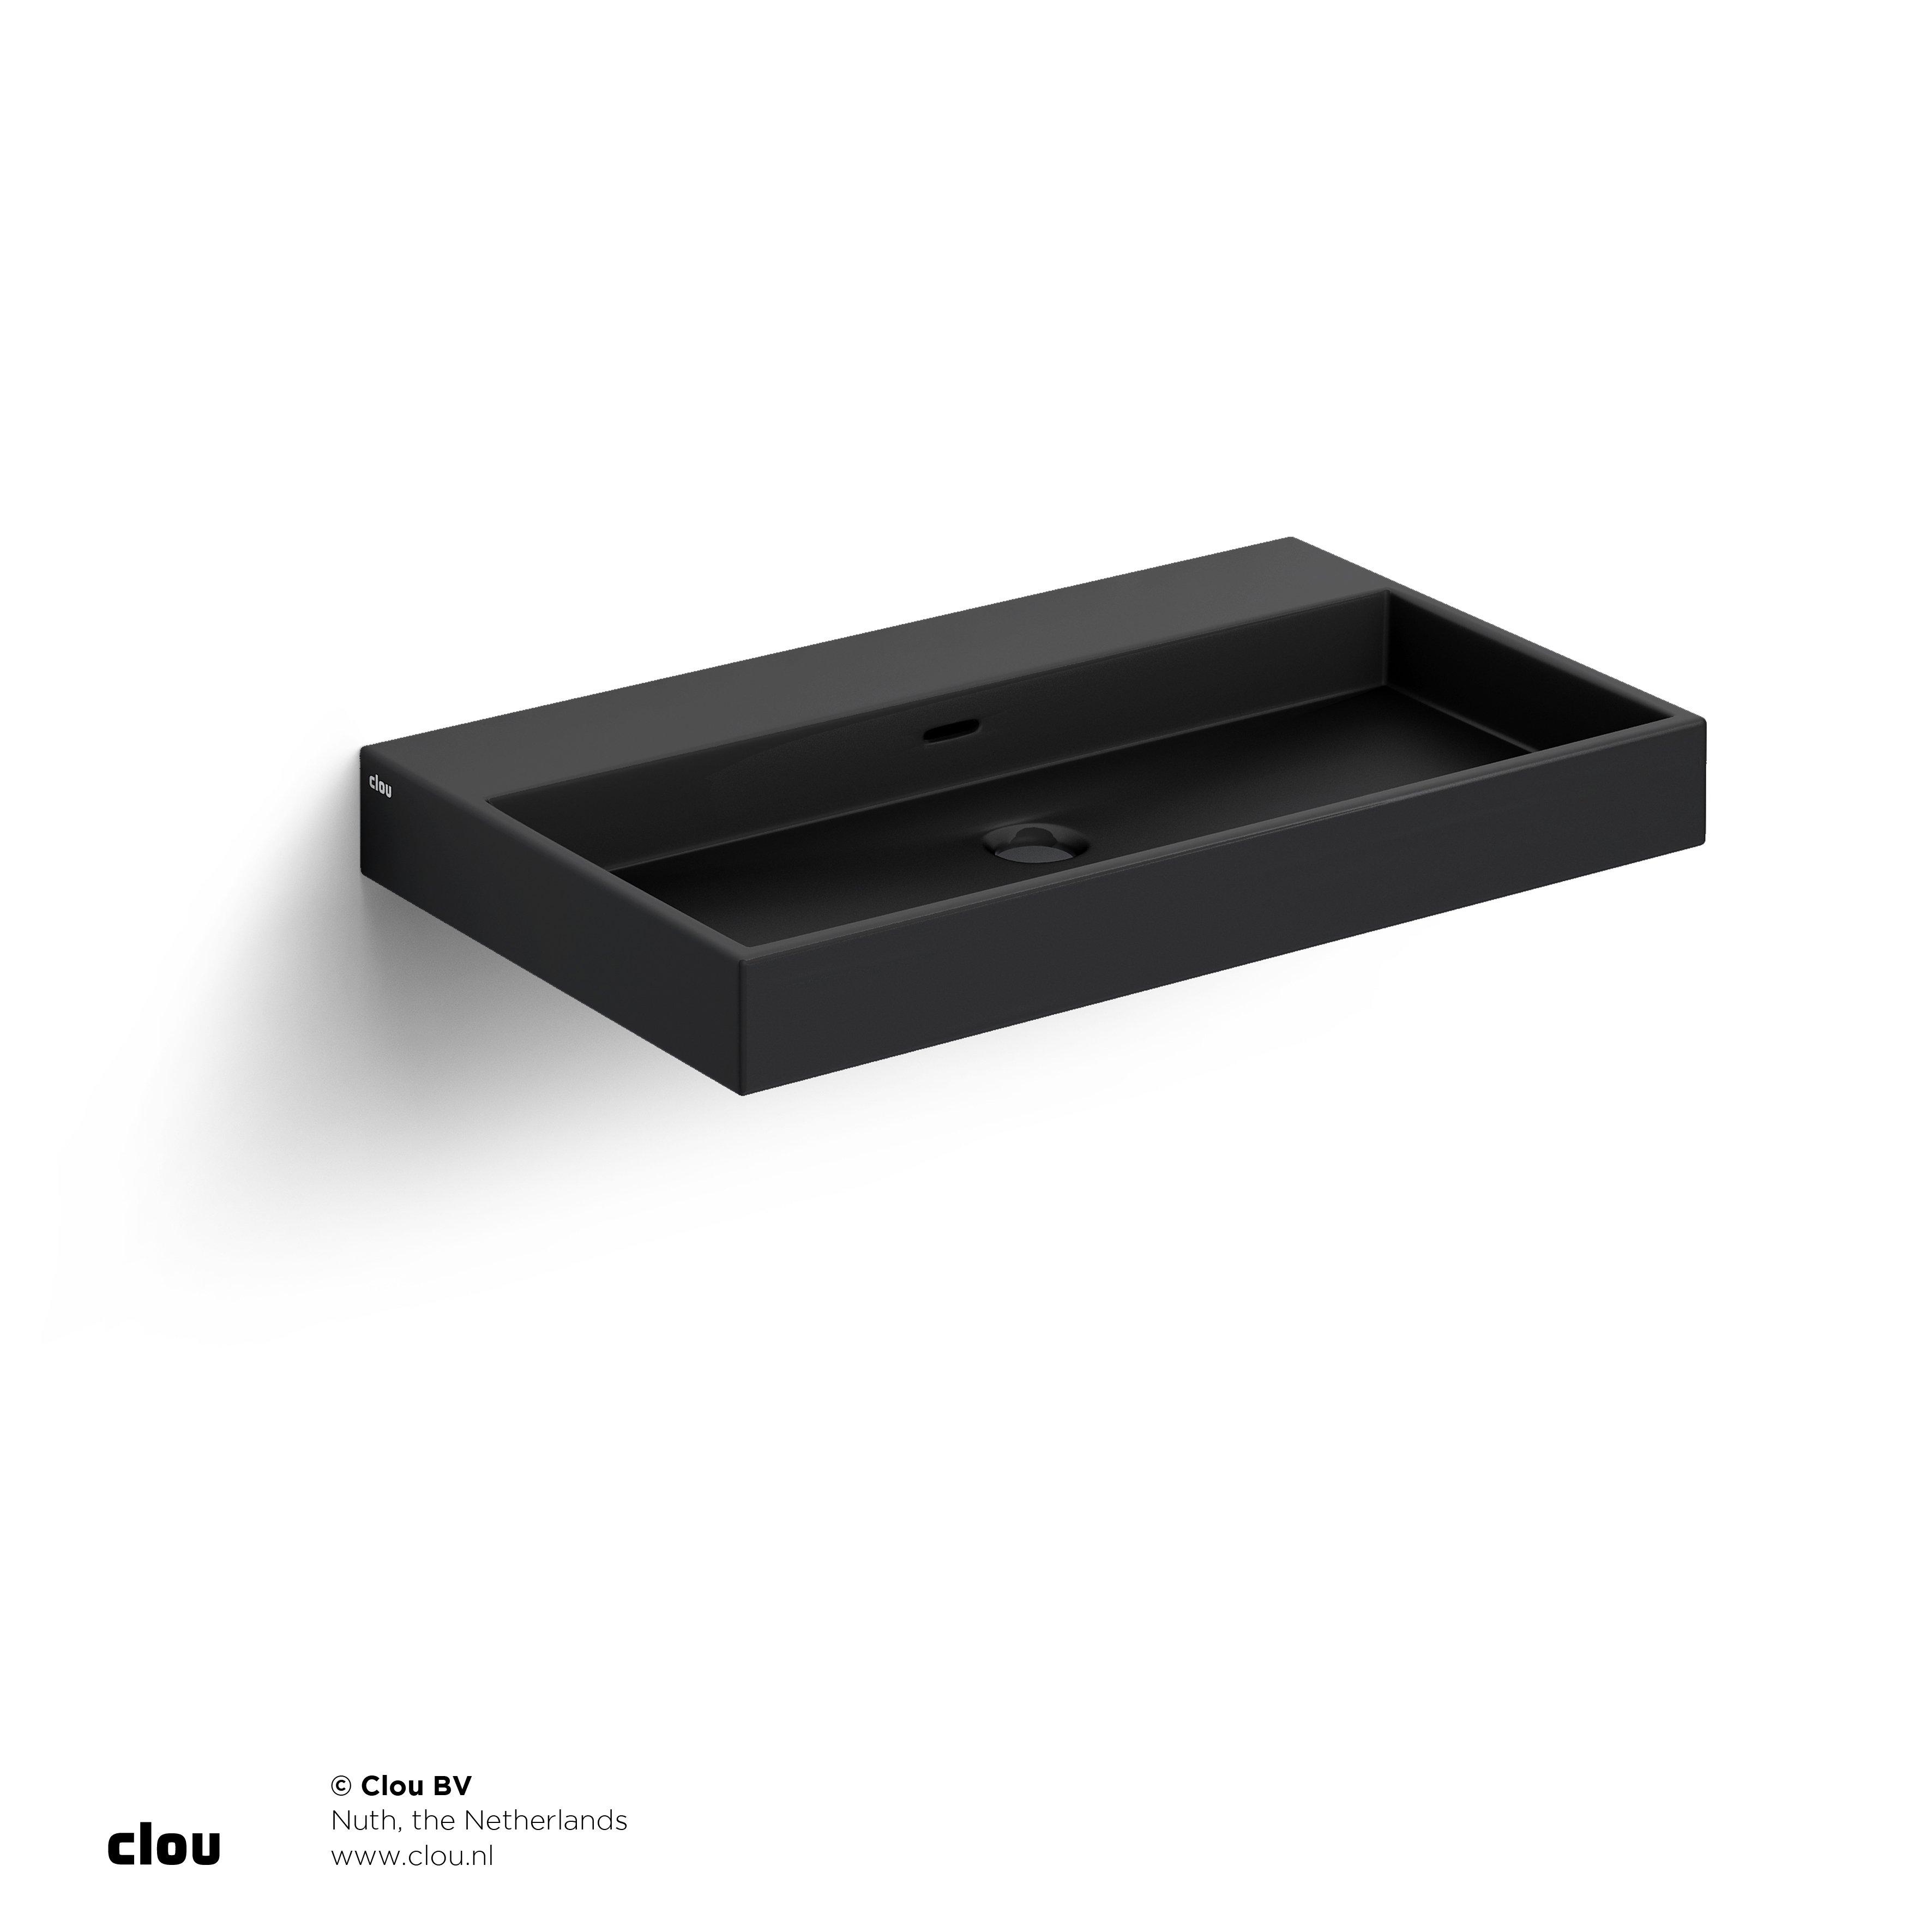 Clou Wash Me wastafel 70cm, zonder plug, mat zwart keramiek